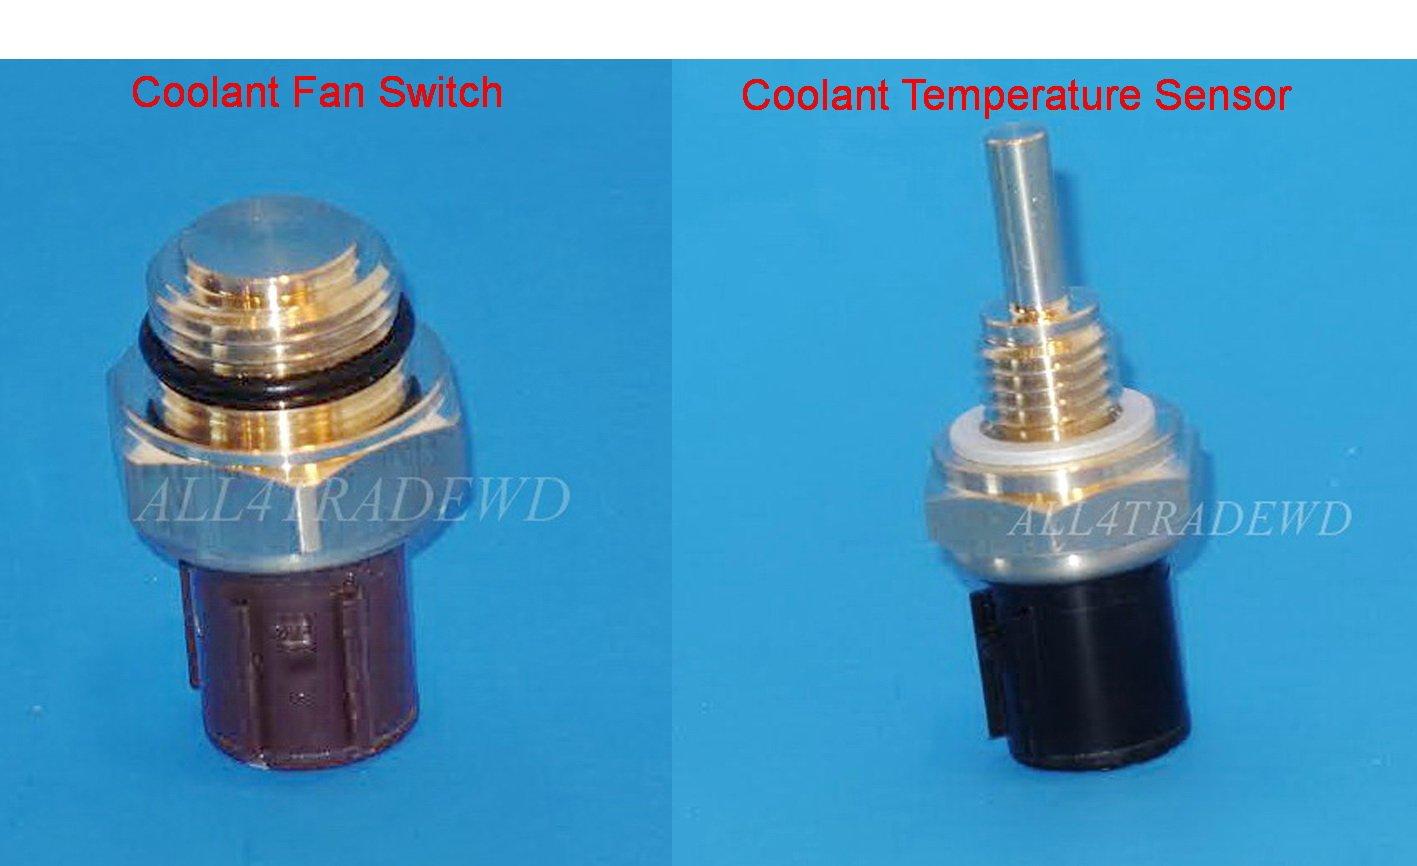 Set of 2 (37760-P00-003 + 37870-PJ7-003)Coolant Fan Switch & Coolant Temperature Sensor Fits:Acura CL Integra MDX·02 TL Honda·Accord Civic Civic del Sol CR-V·Insight· Odyssey 1 Pilot S2000 Isuzu·Oasis